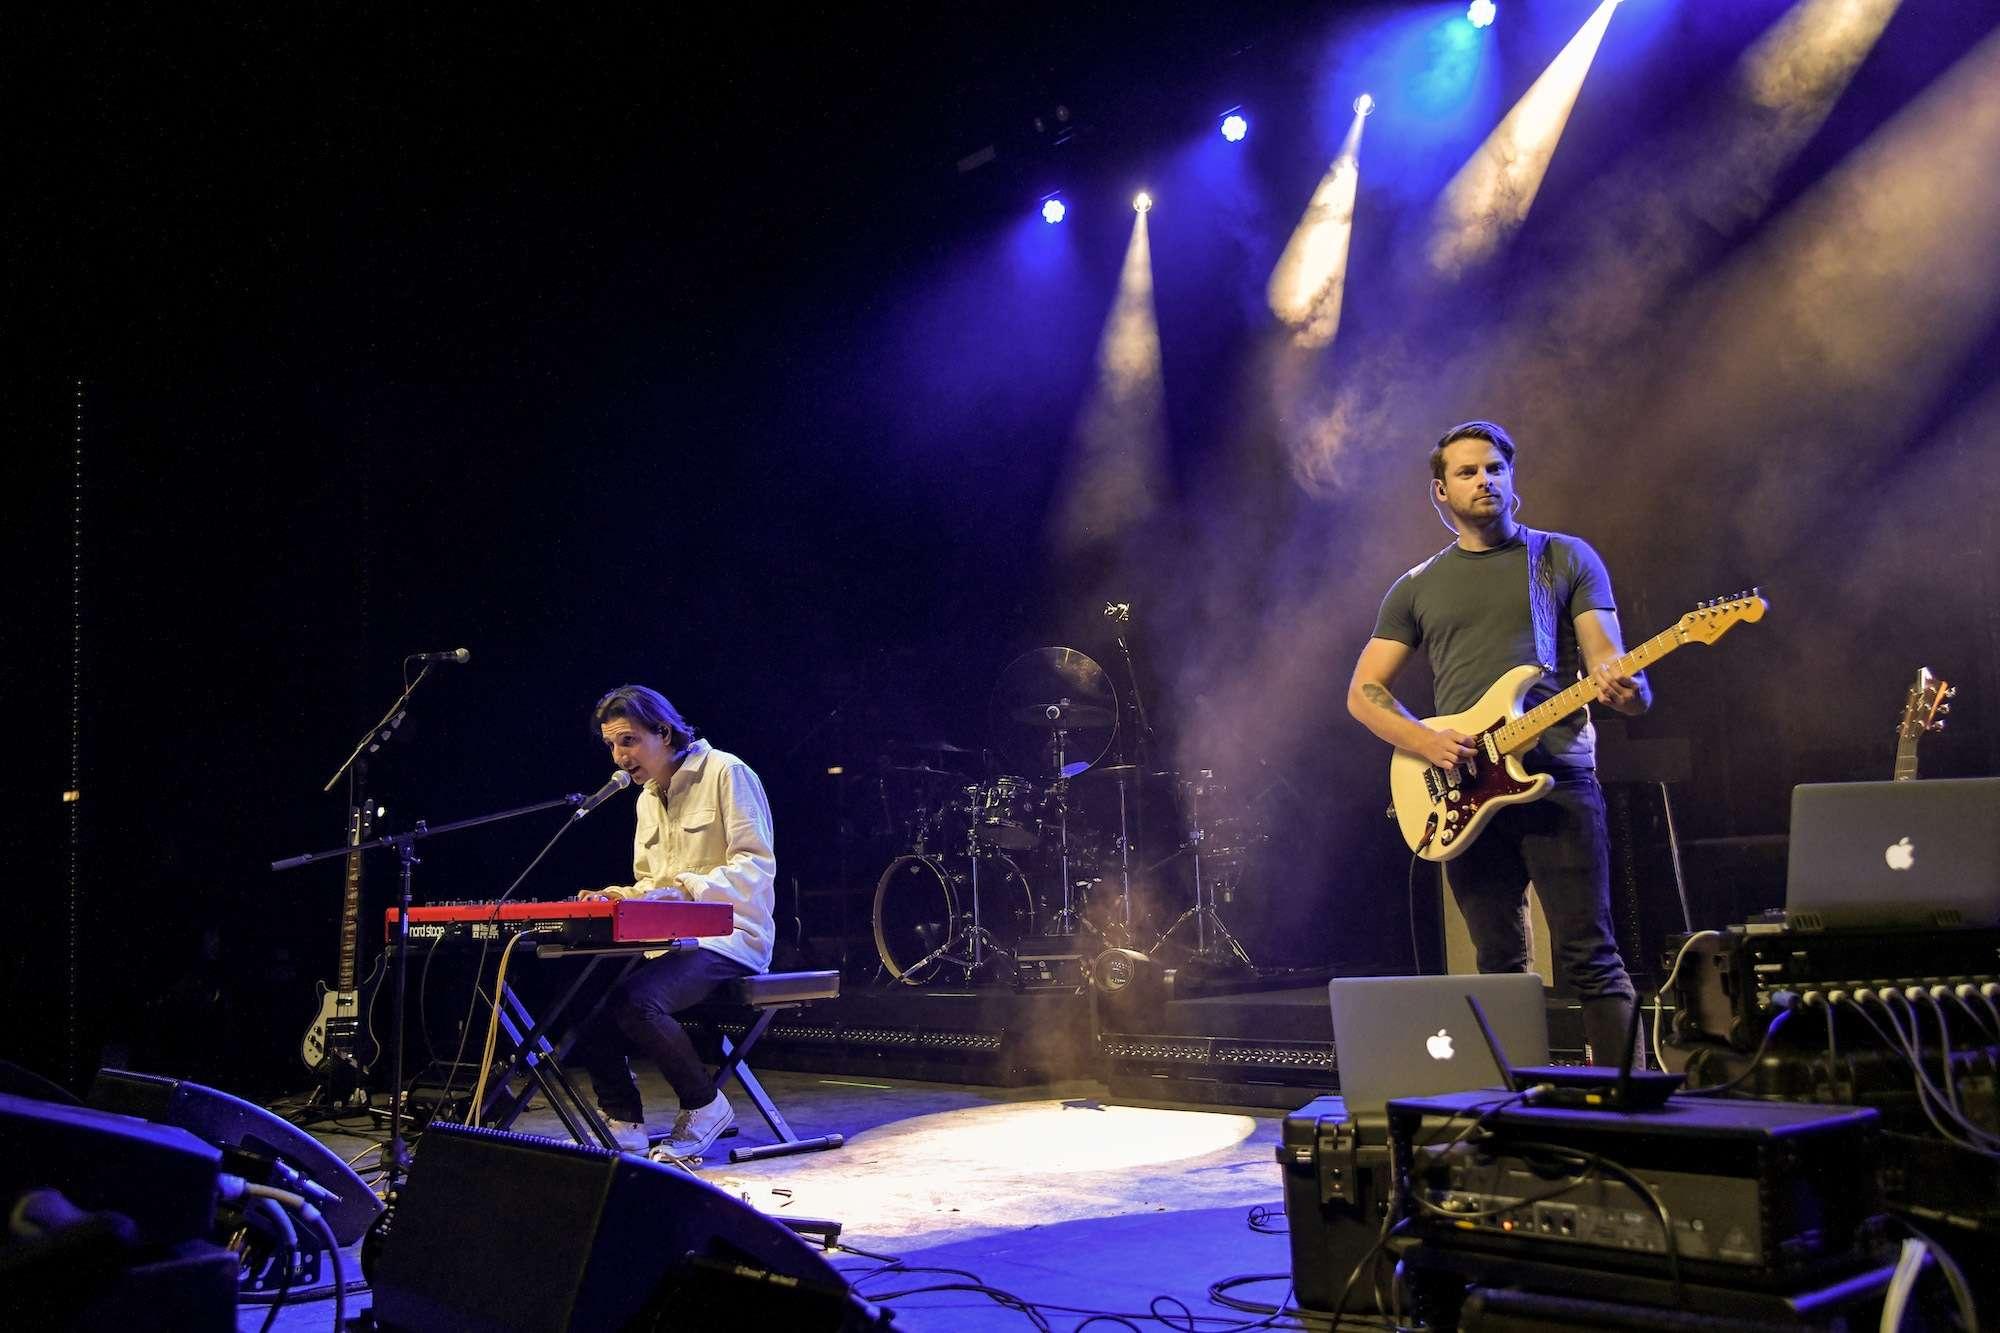 Anson Seabra Live at Riviera [GALLERY] 3